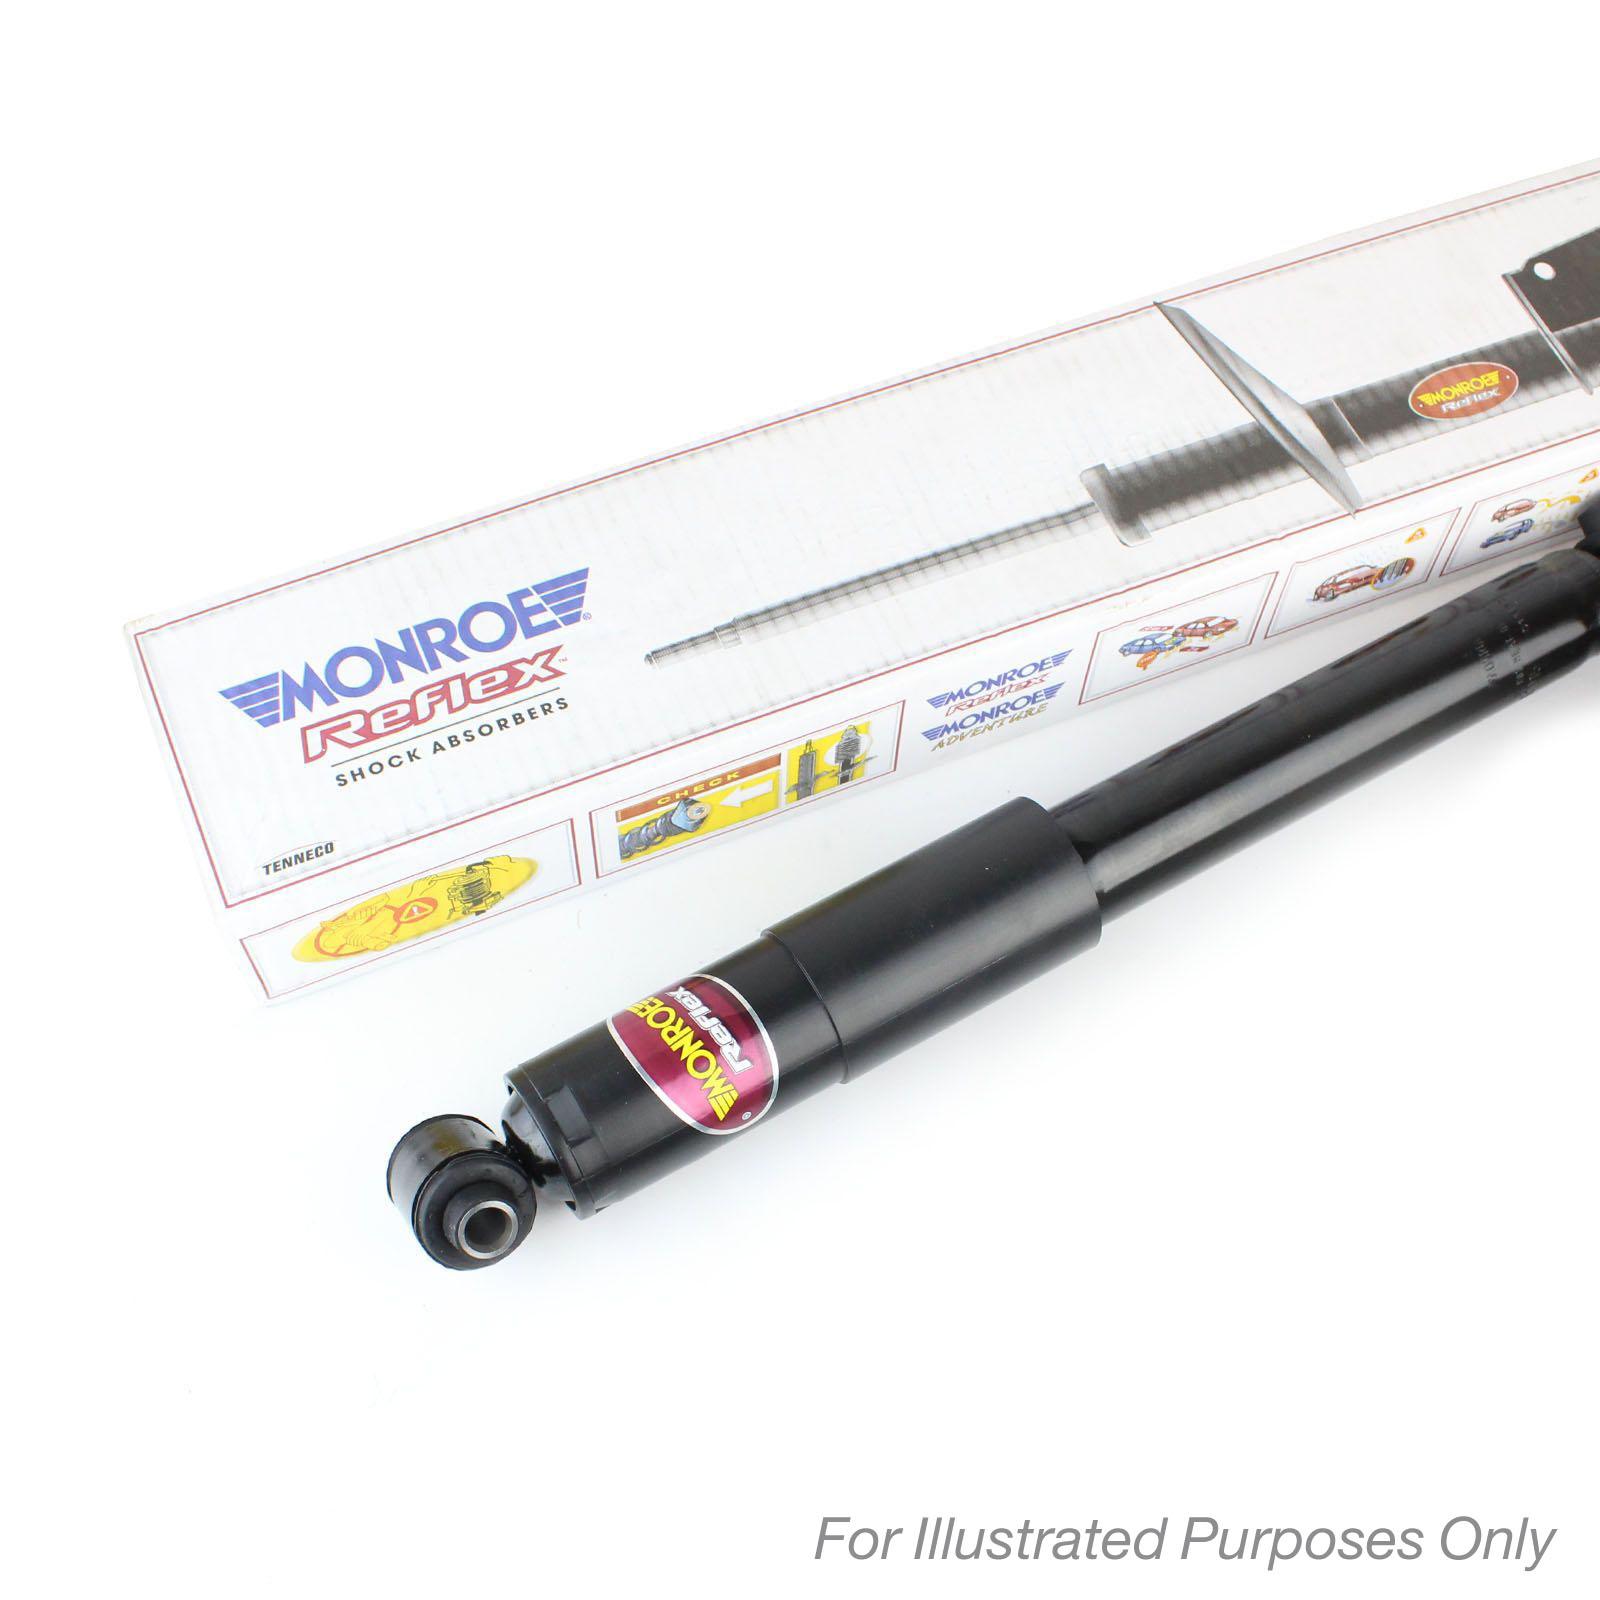 Shock Absorber Replacement : Monroe reflex rear shock absorbers genuine suspension